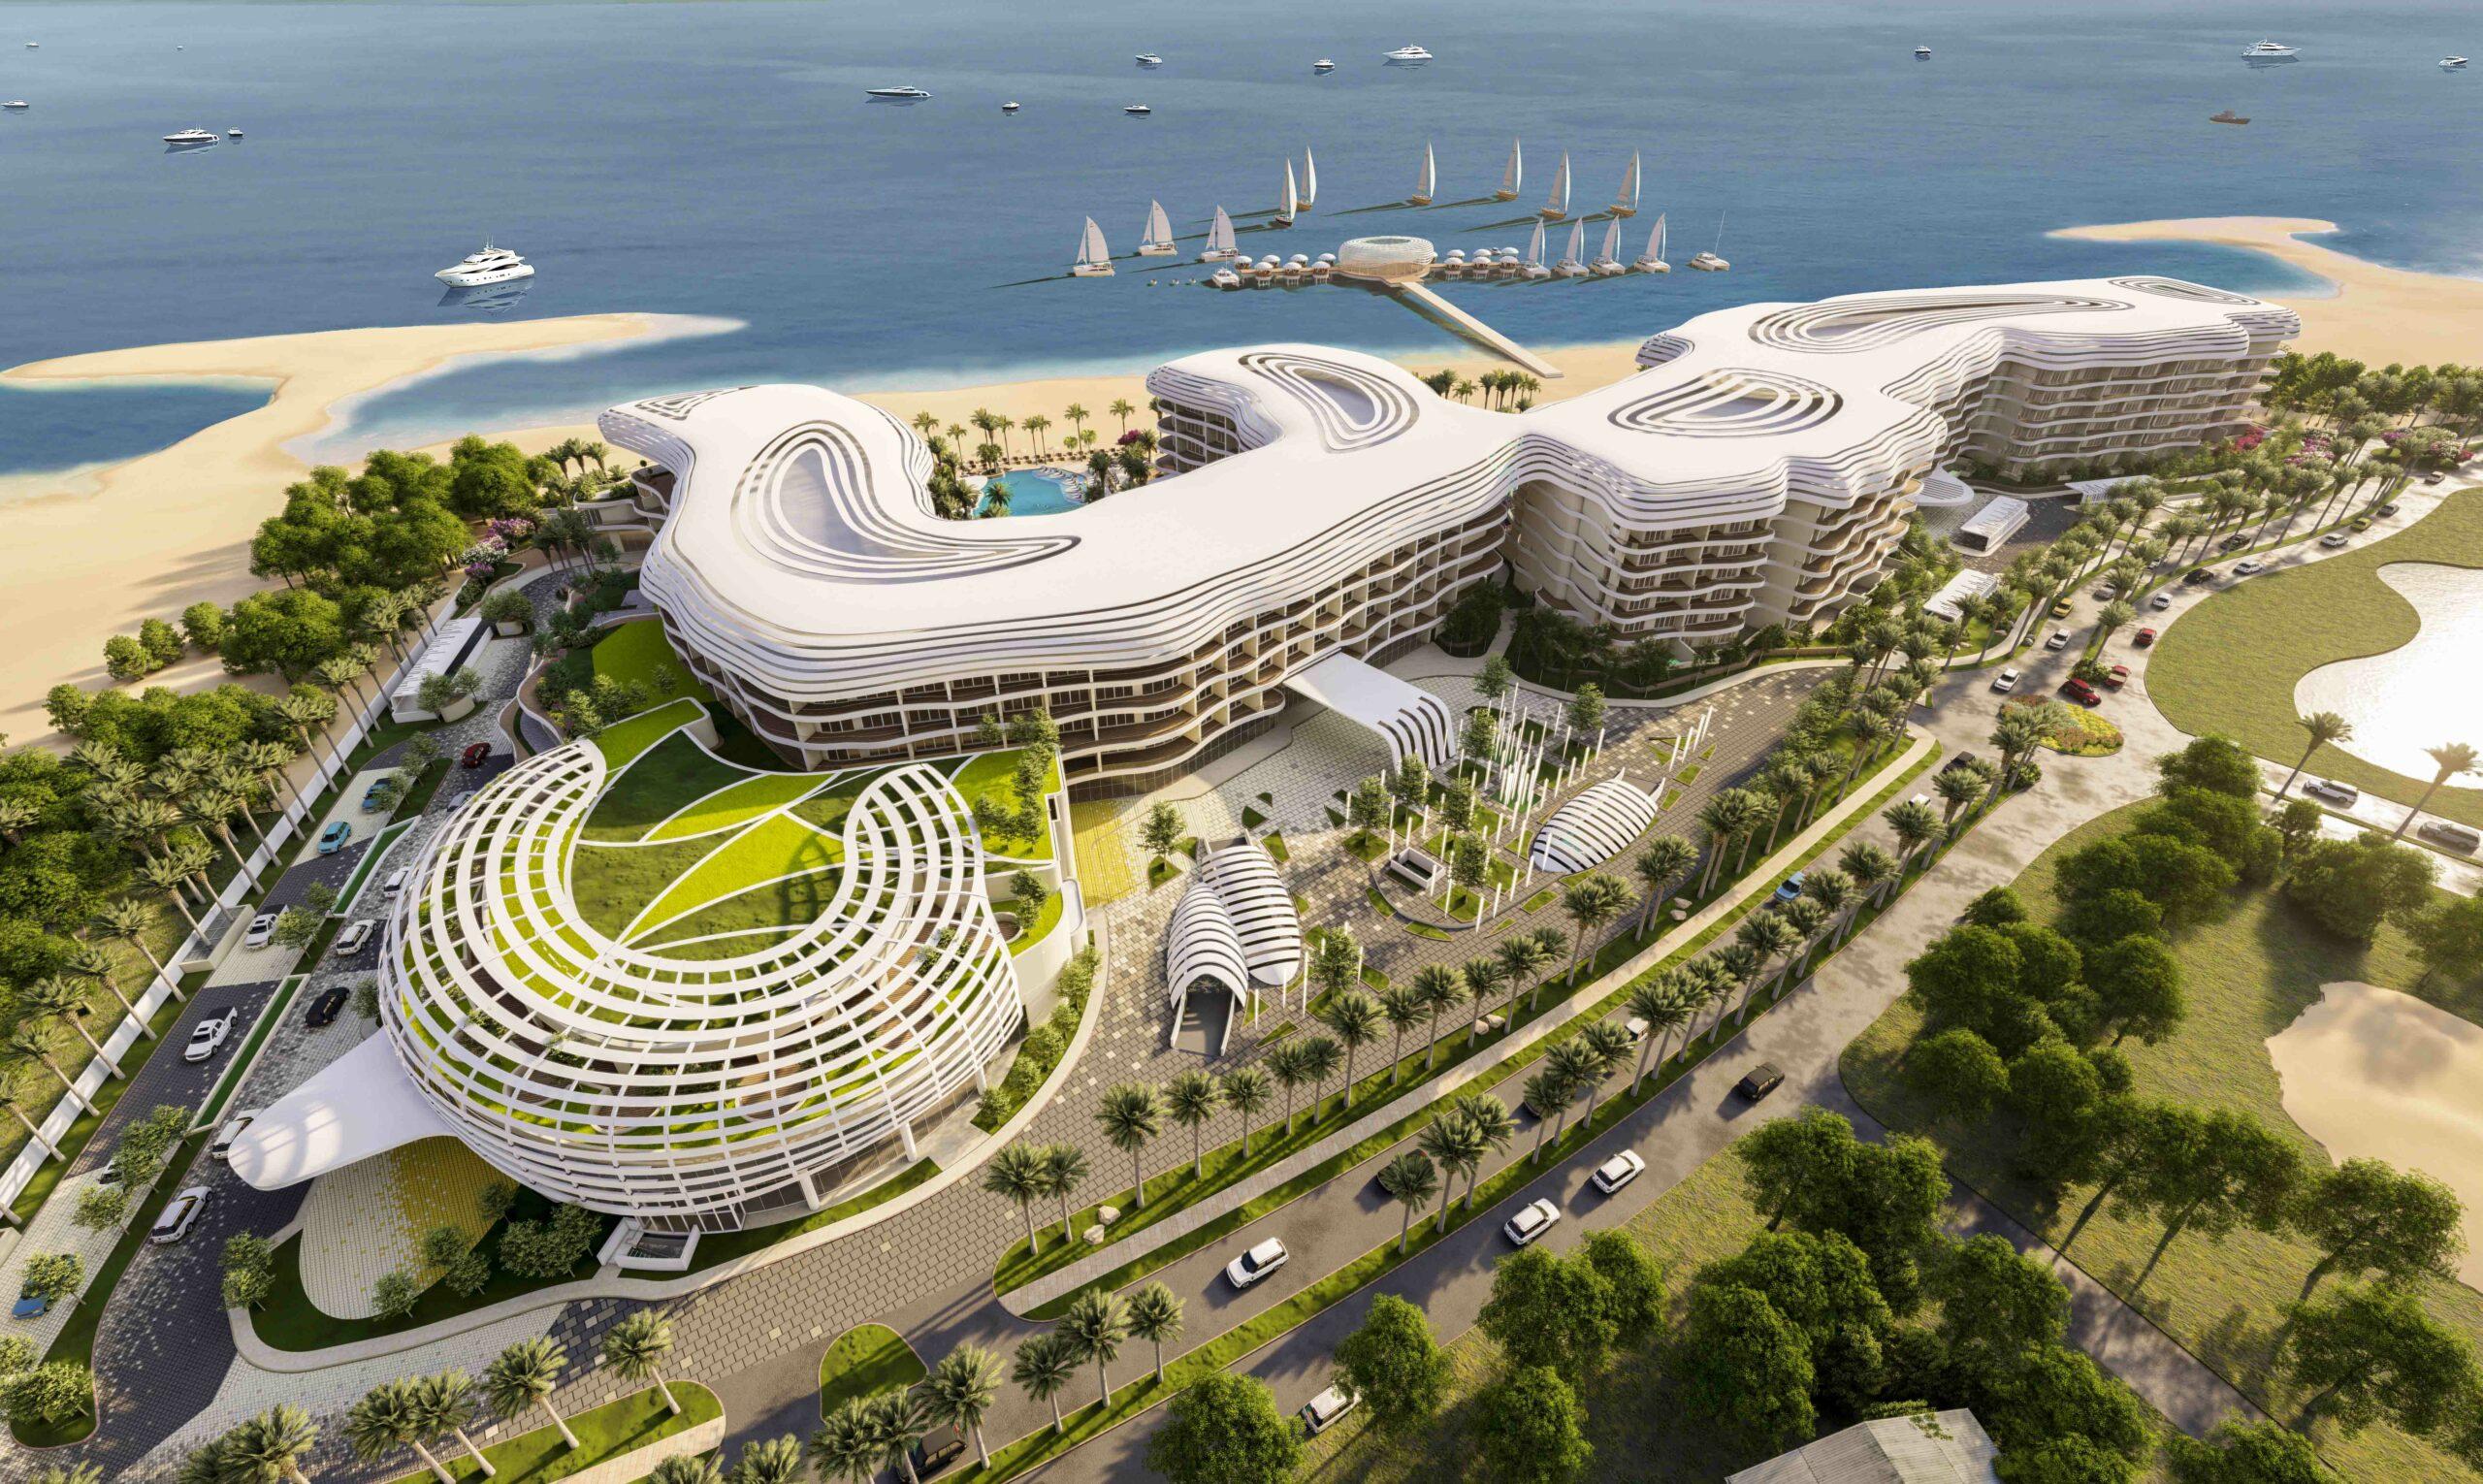 St. Regis, Muscat, Oman